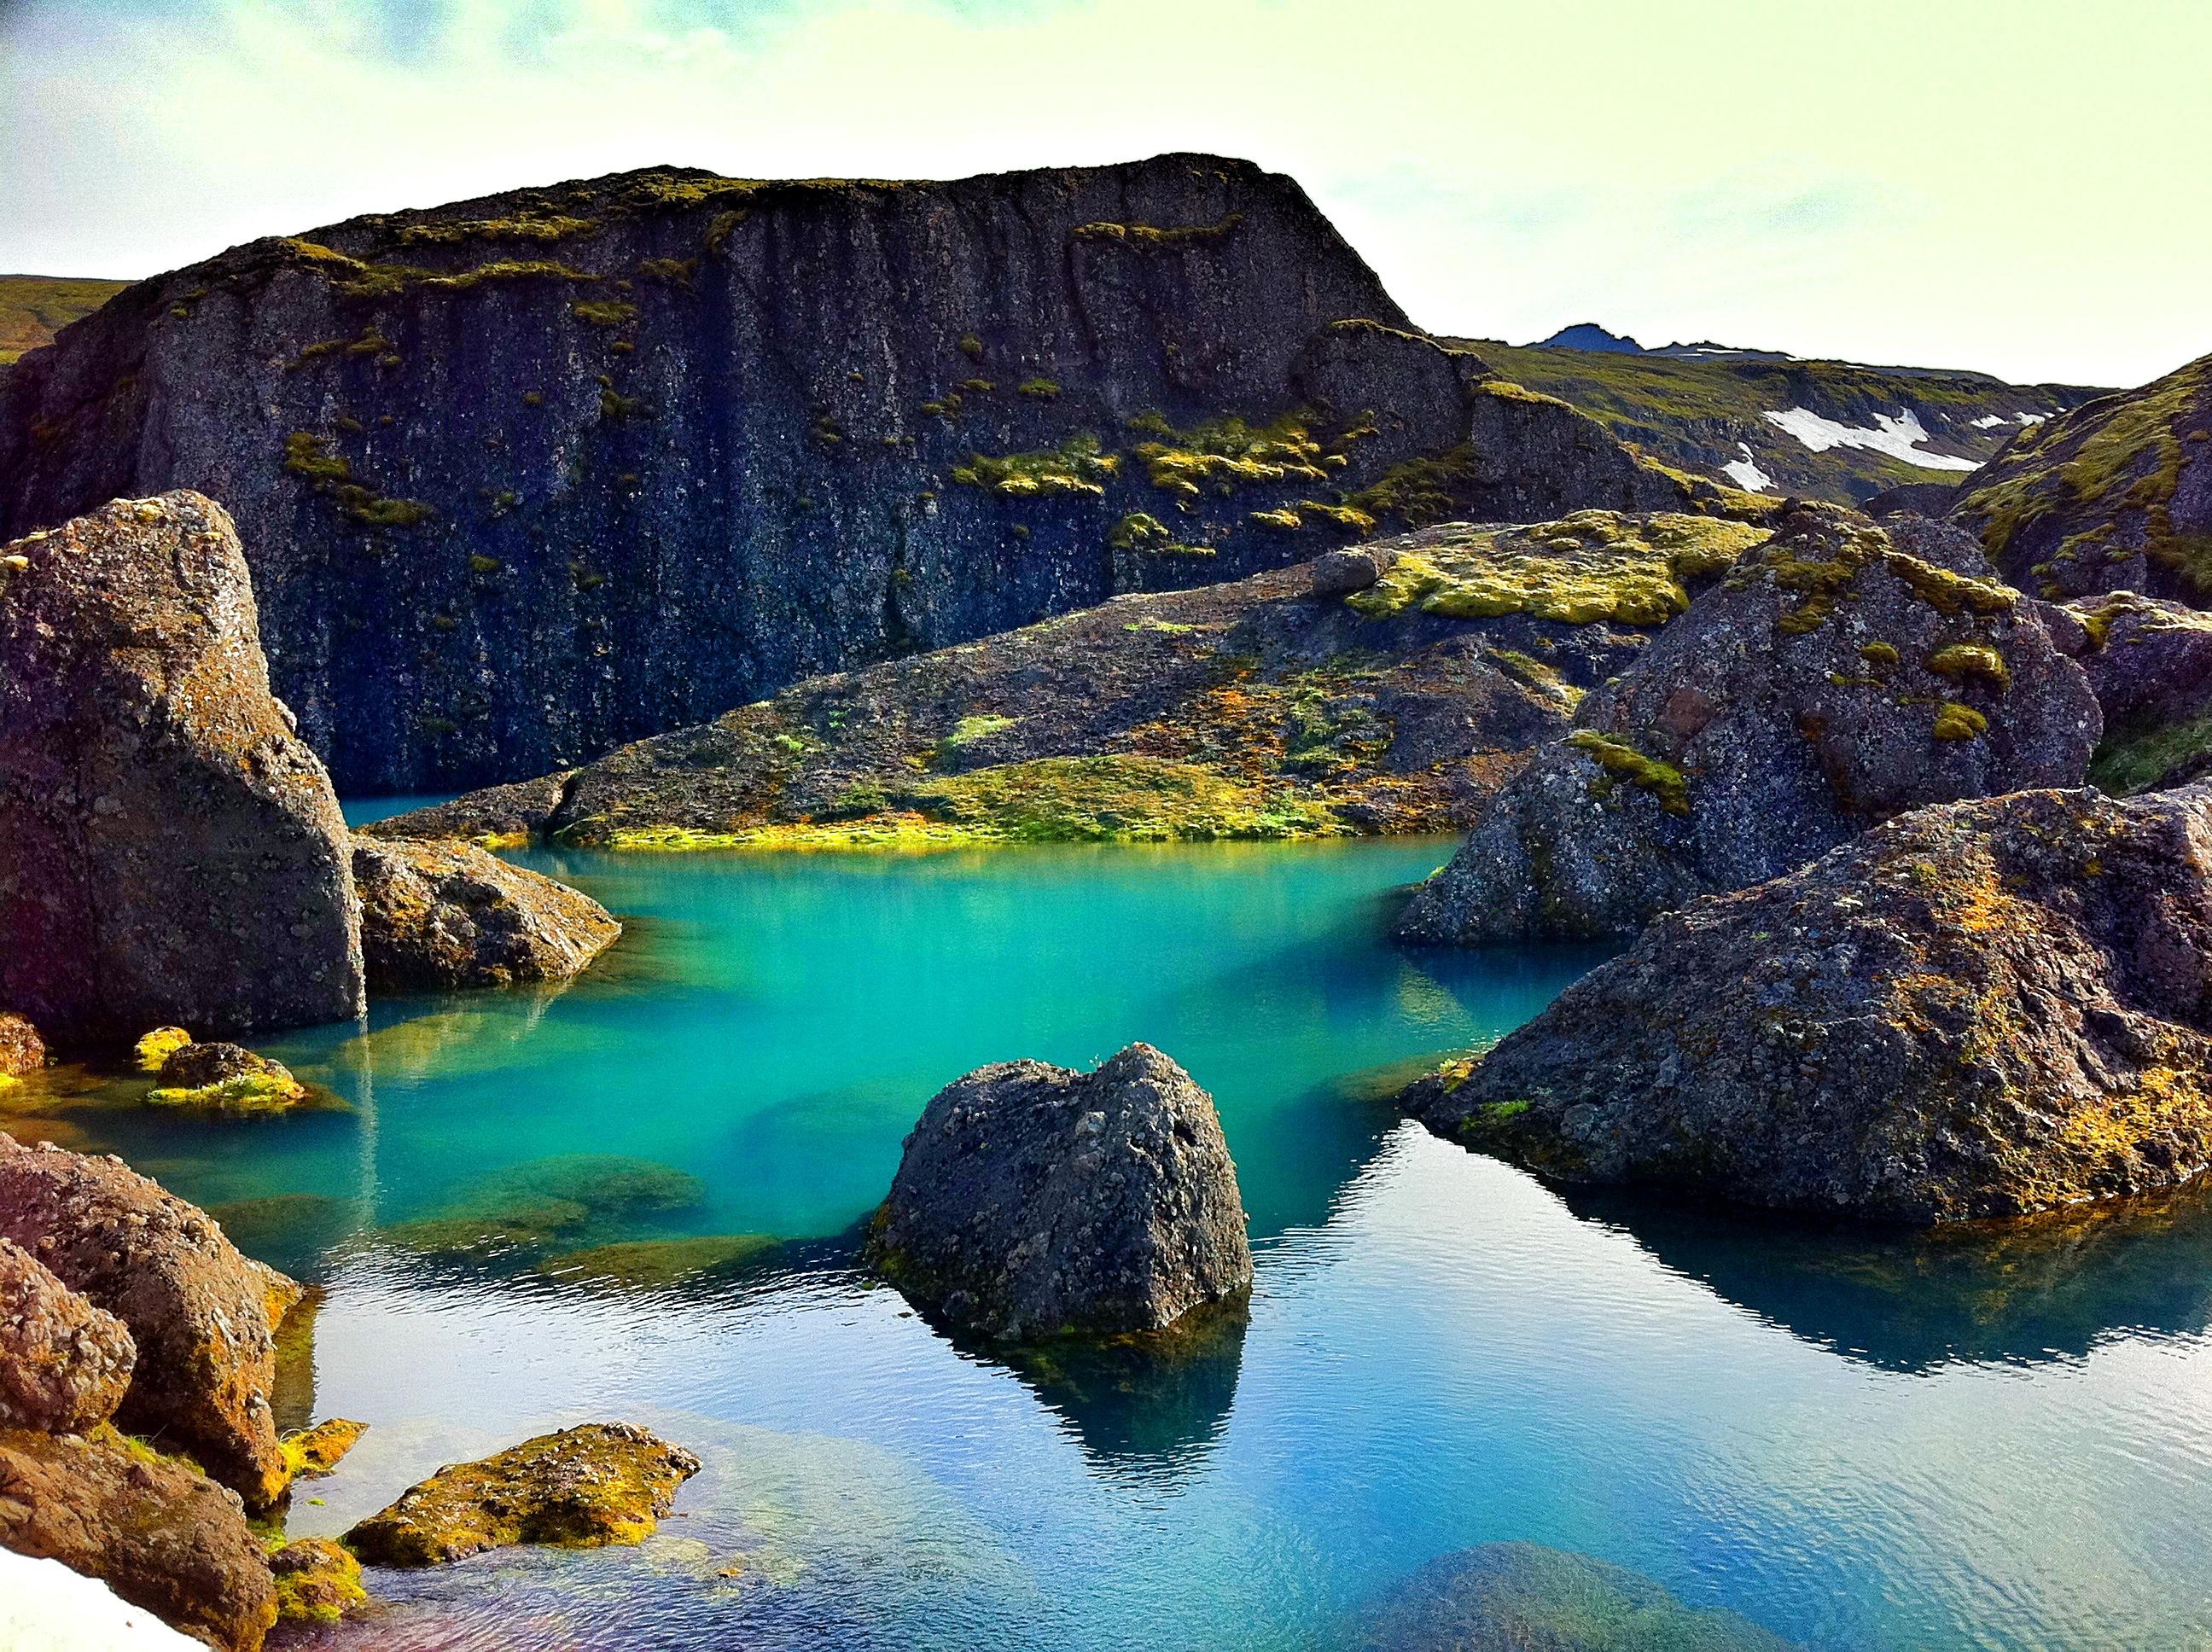 Stórurð是一条在Borgarfjörður eystri镇附近著名的徒步路线